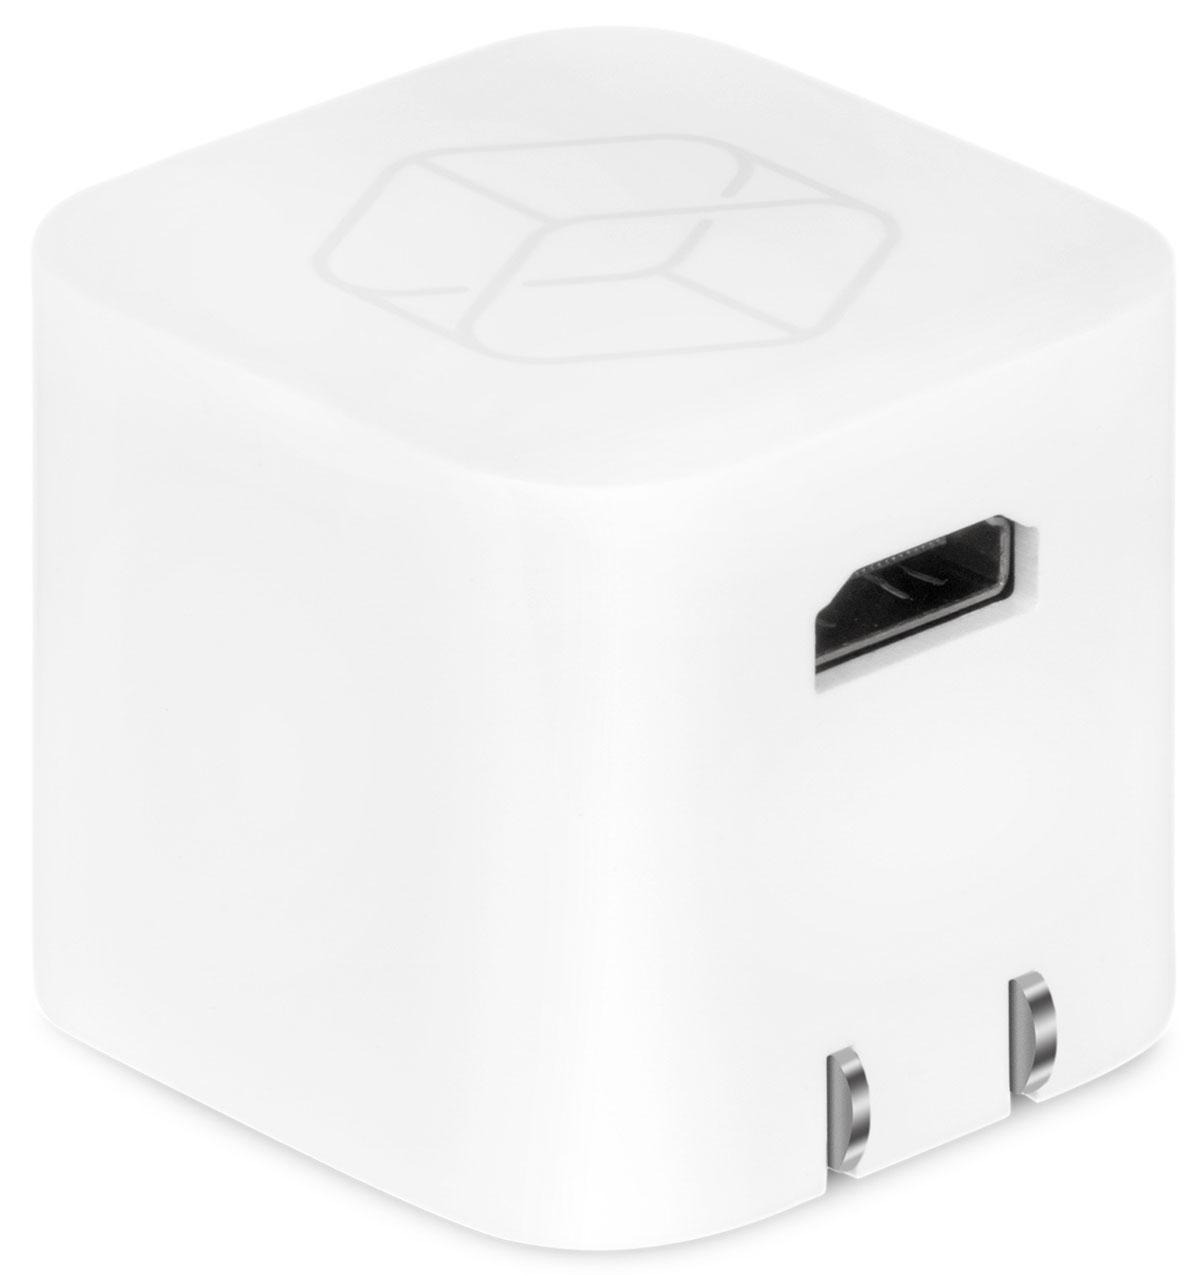 Rombica Cube A5 медиаплеер - Медиаплееры